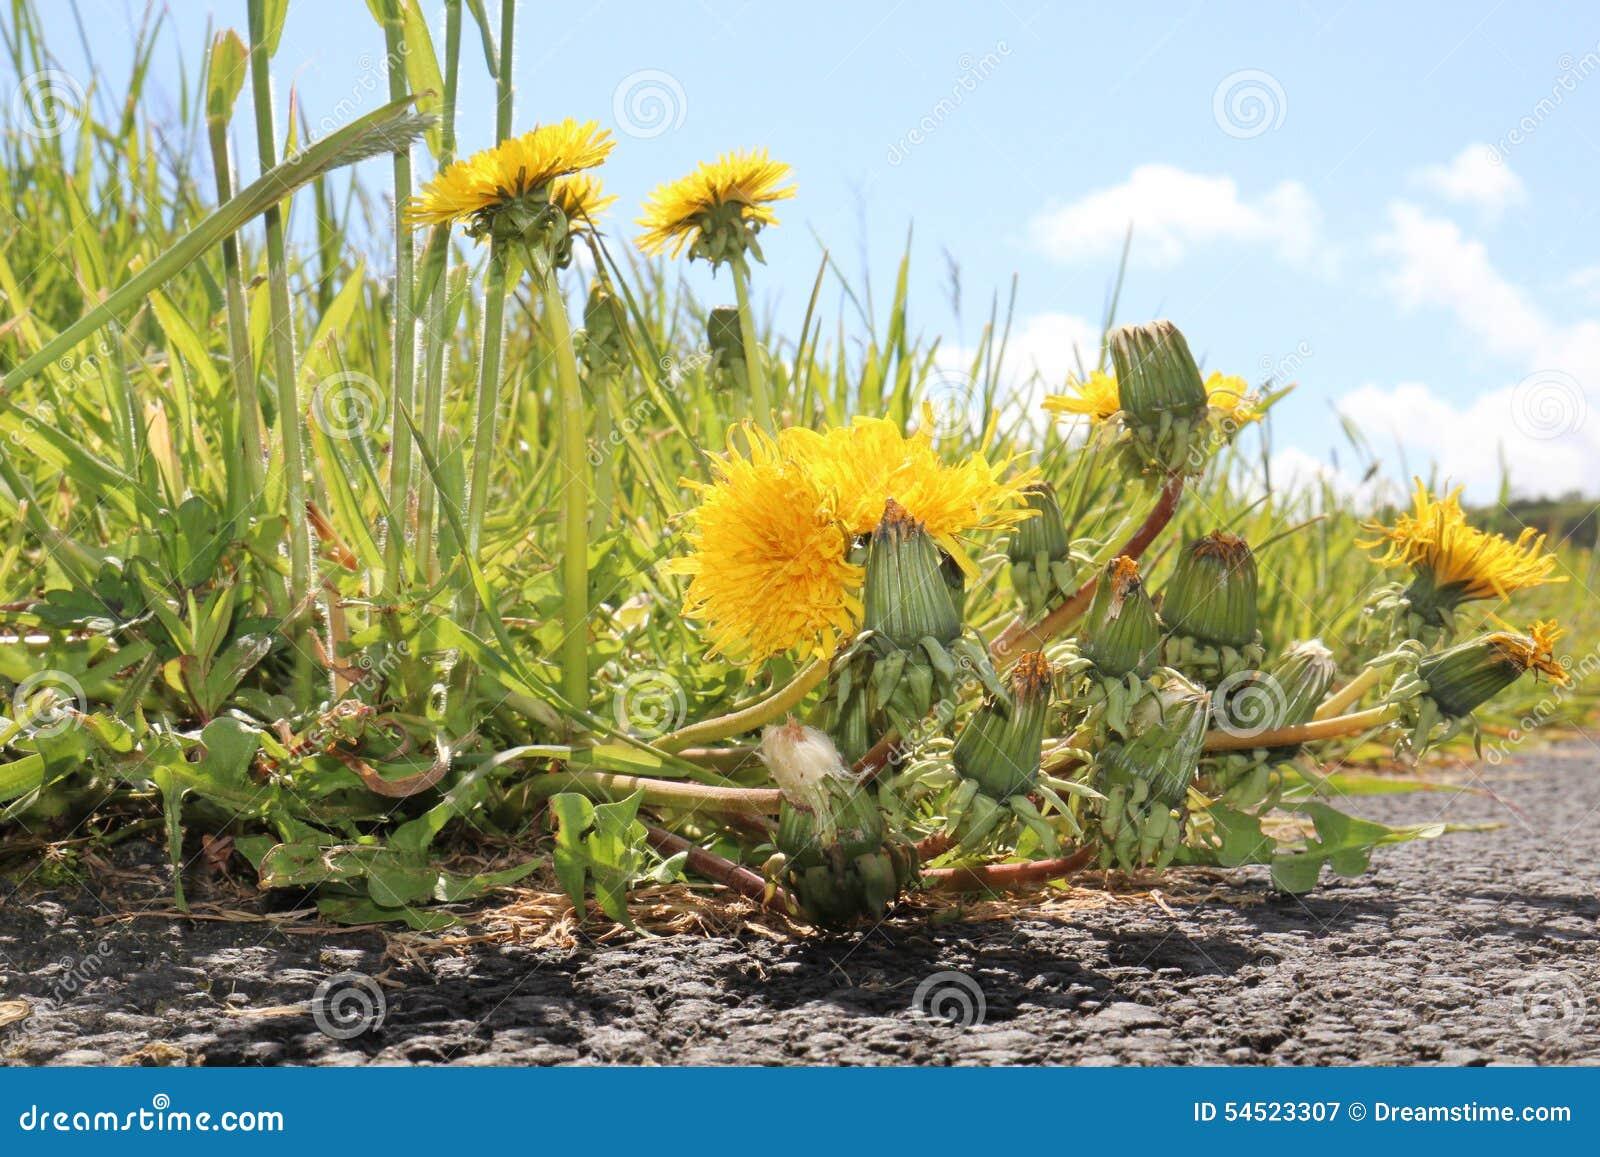 Flowers Scotland Weeds Sun Dying Stock Image Image Of Walking